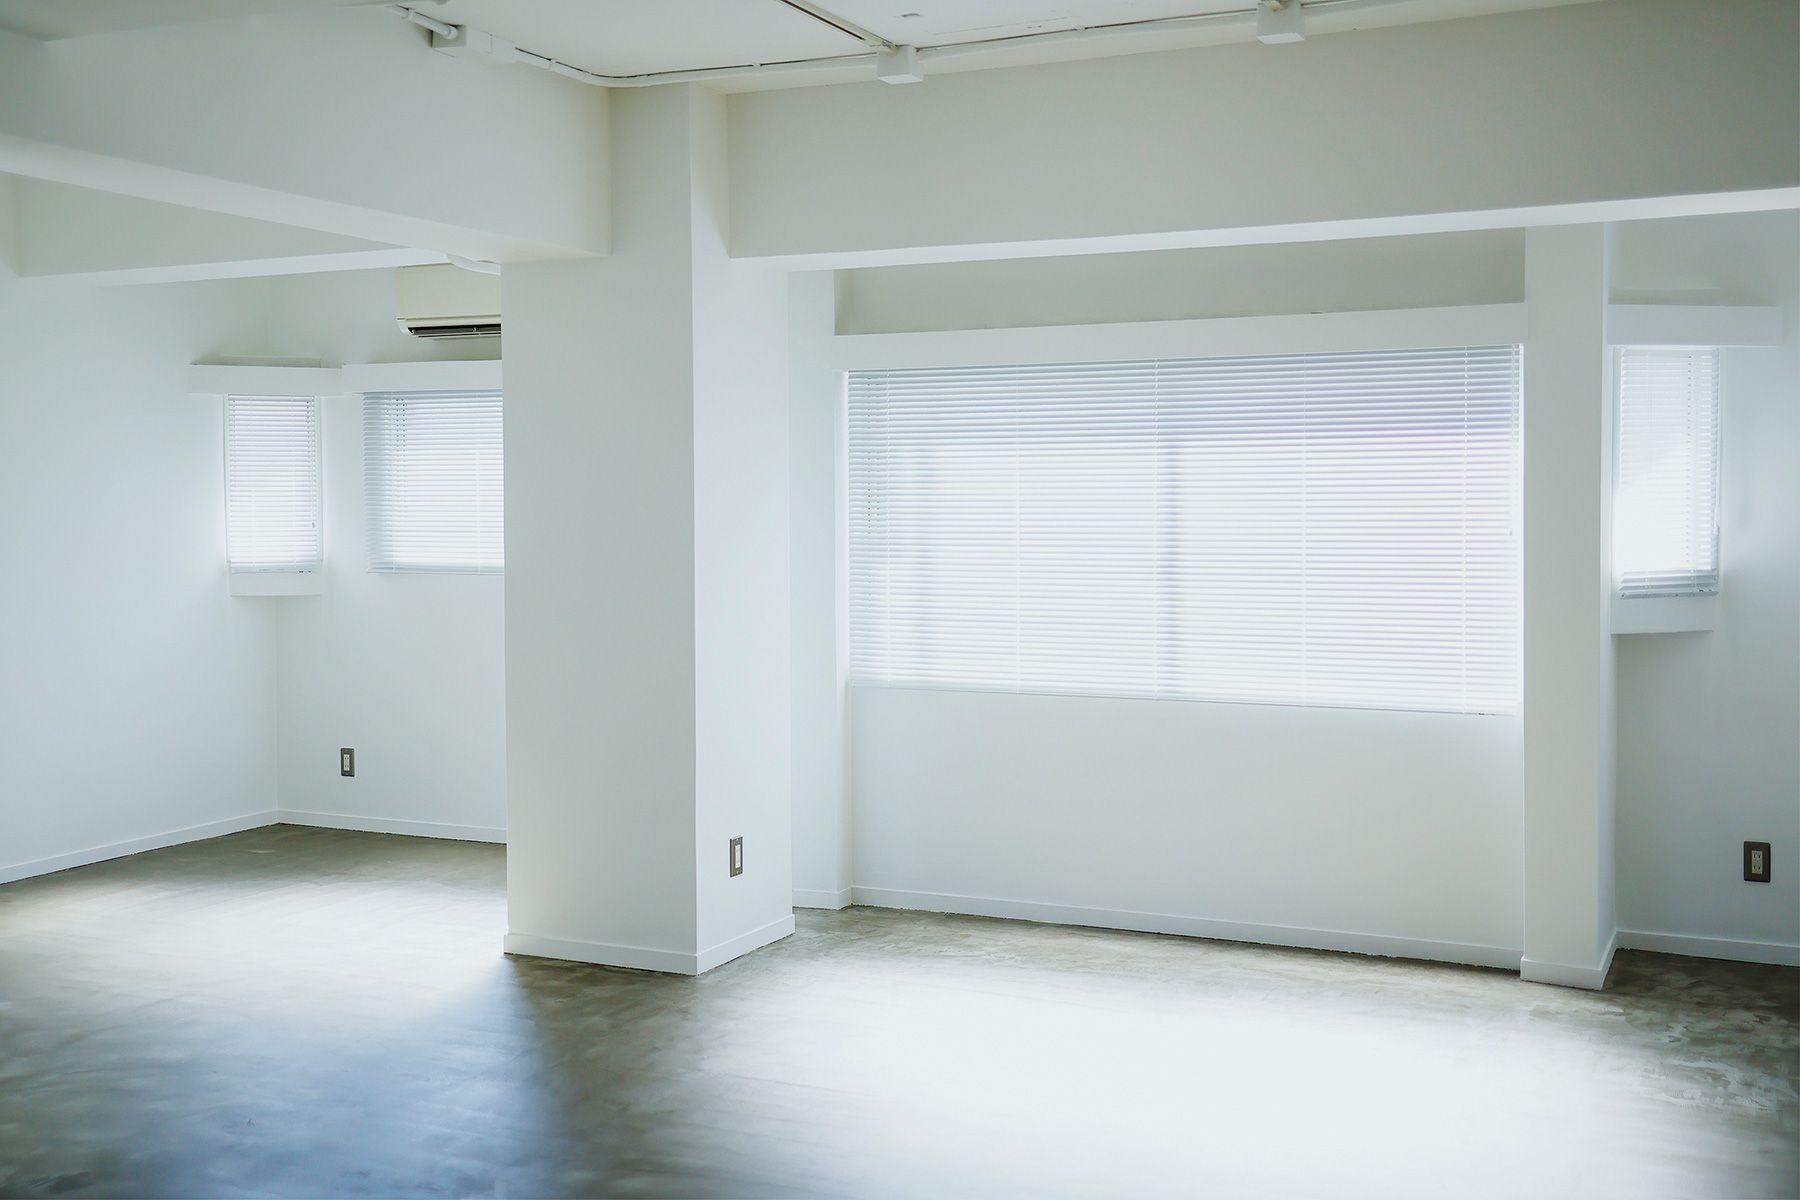 STUDIO LILLARD (スタジオ リラード)南向き複数の窓